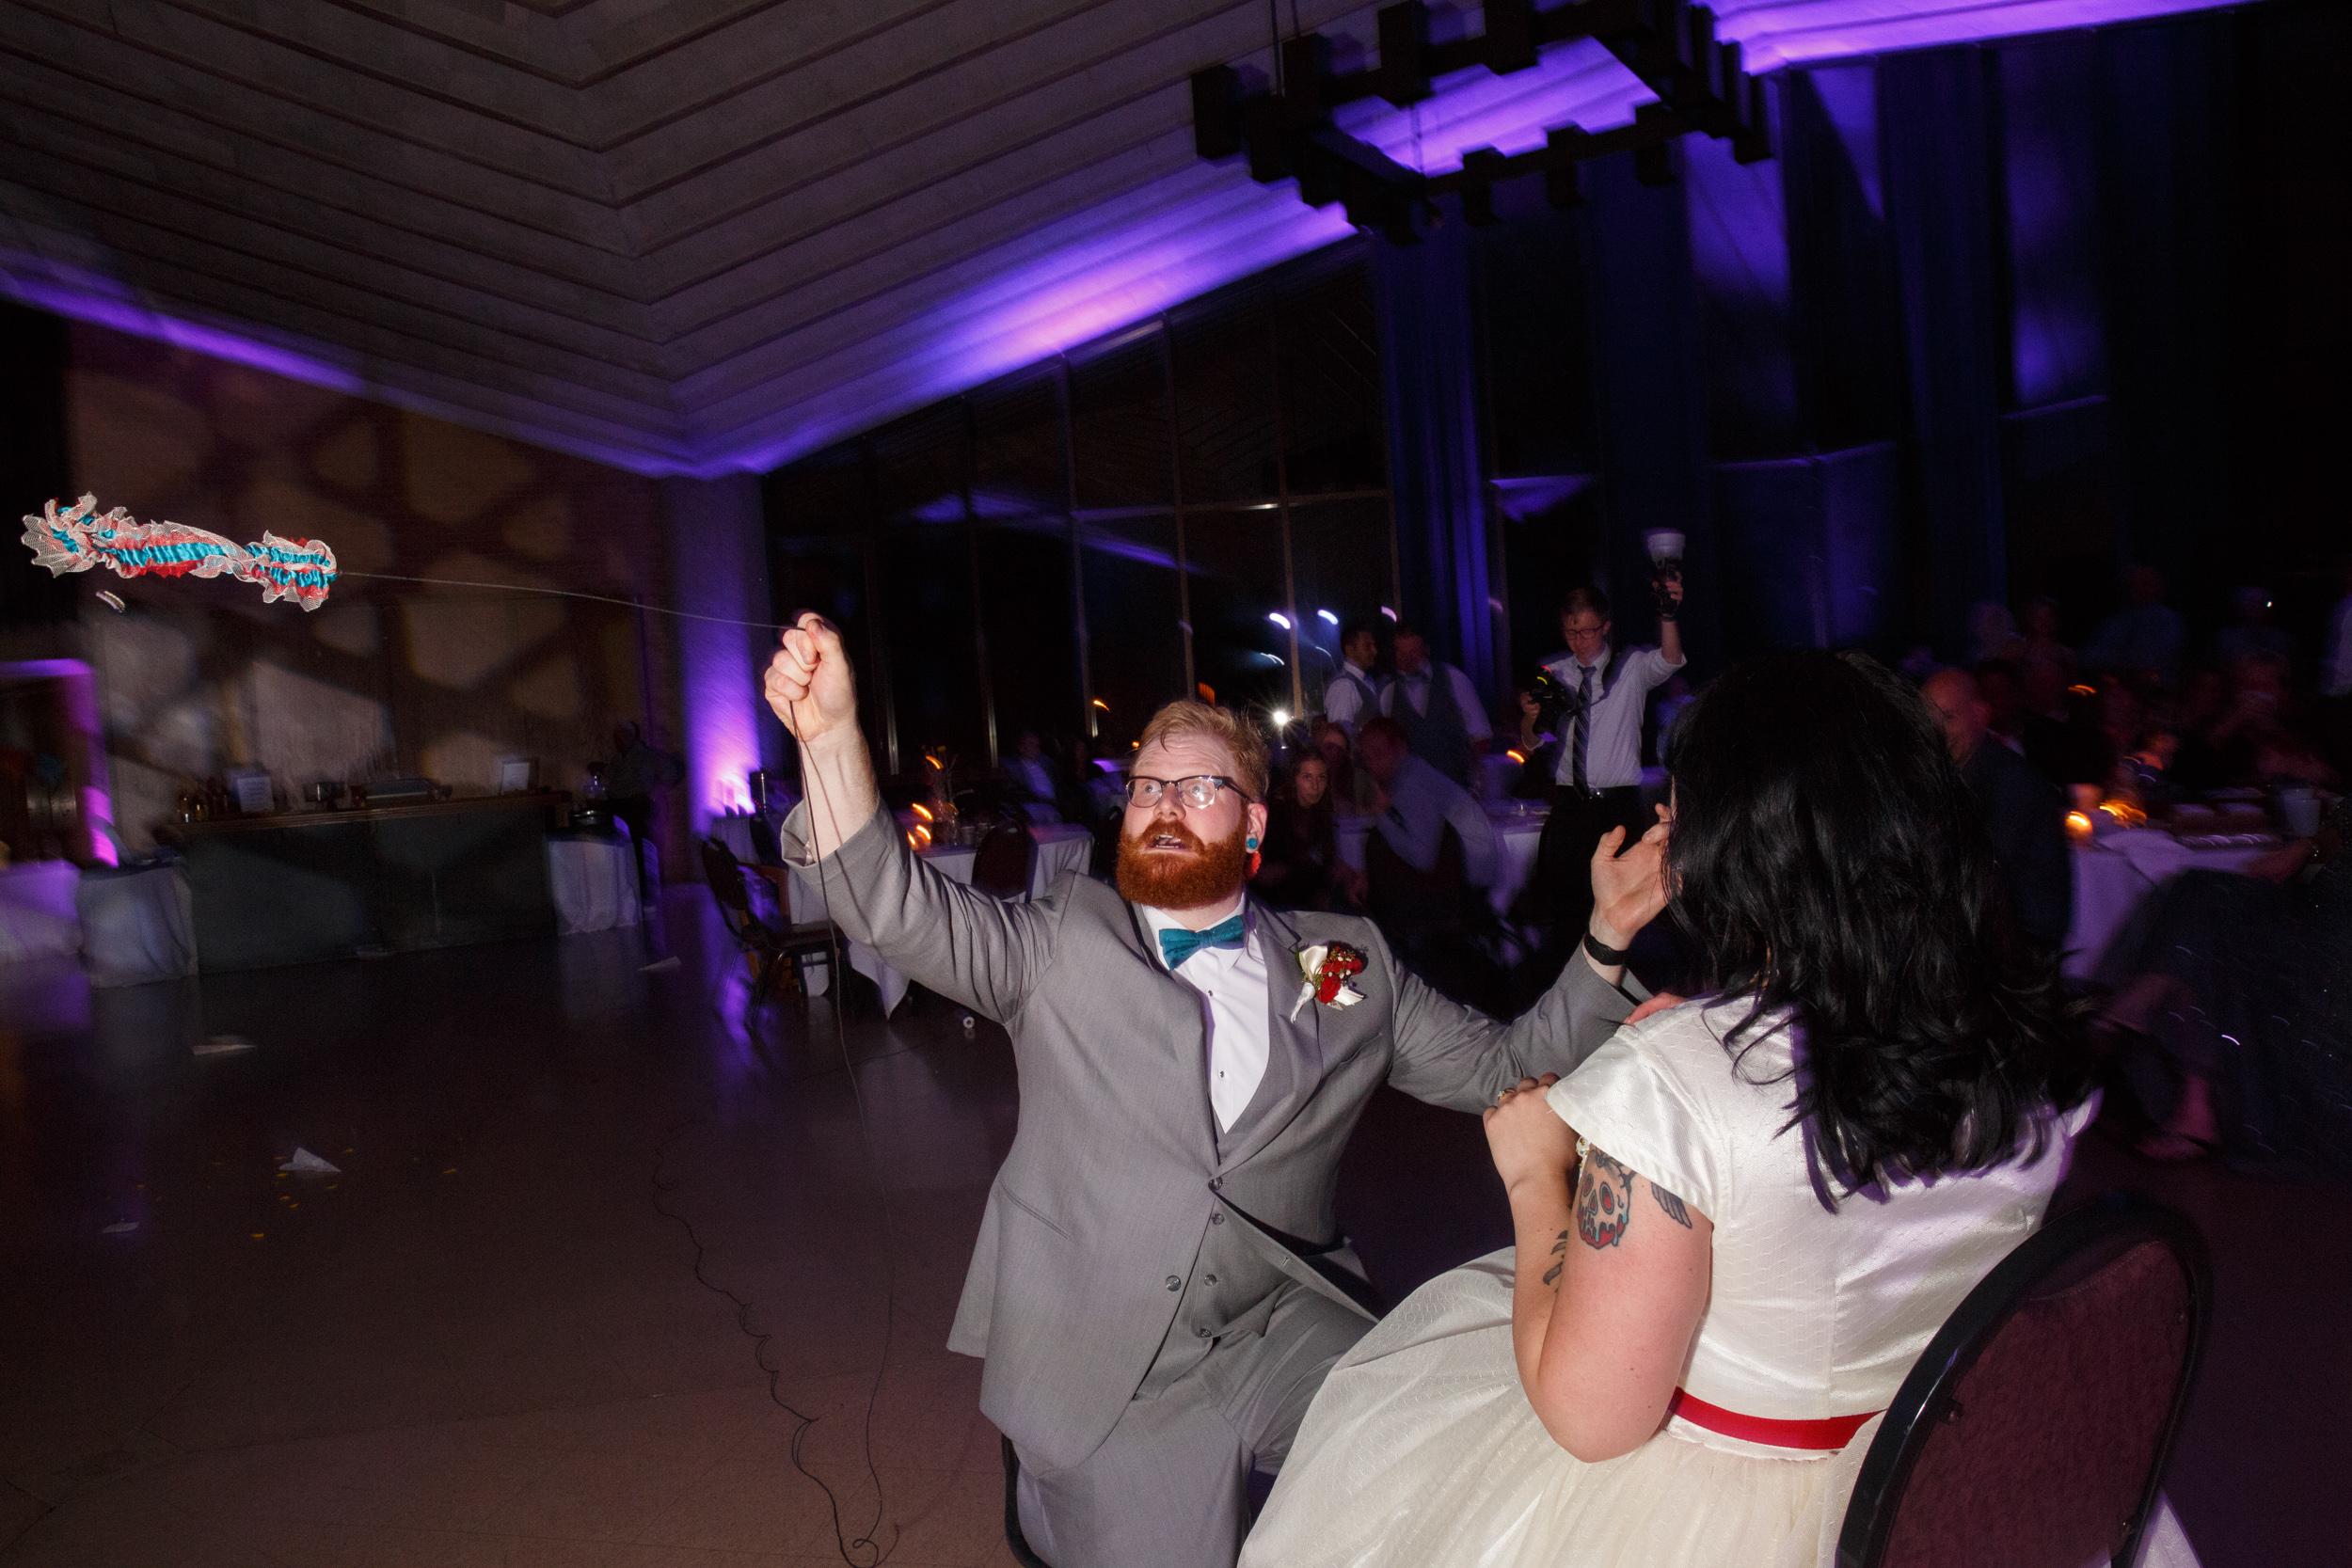 Christian & Sarah wedding photography by Brian milo-277.jpg